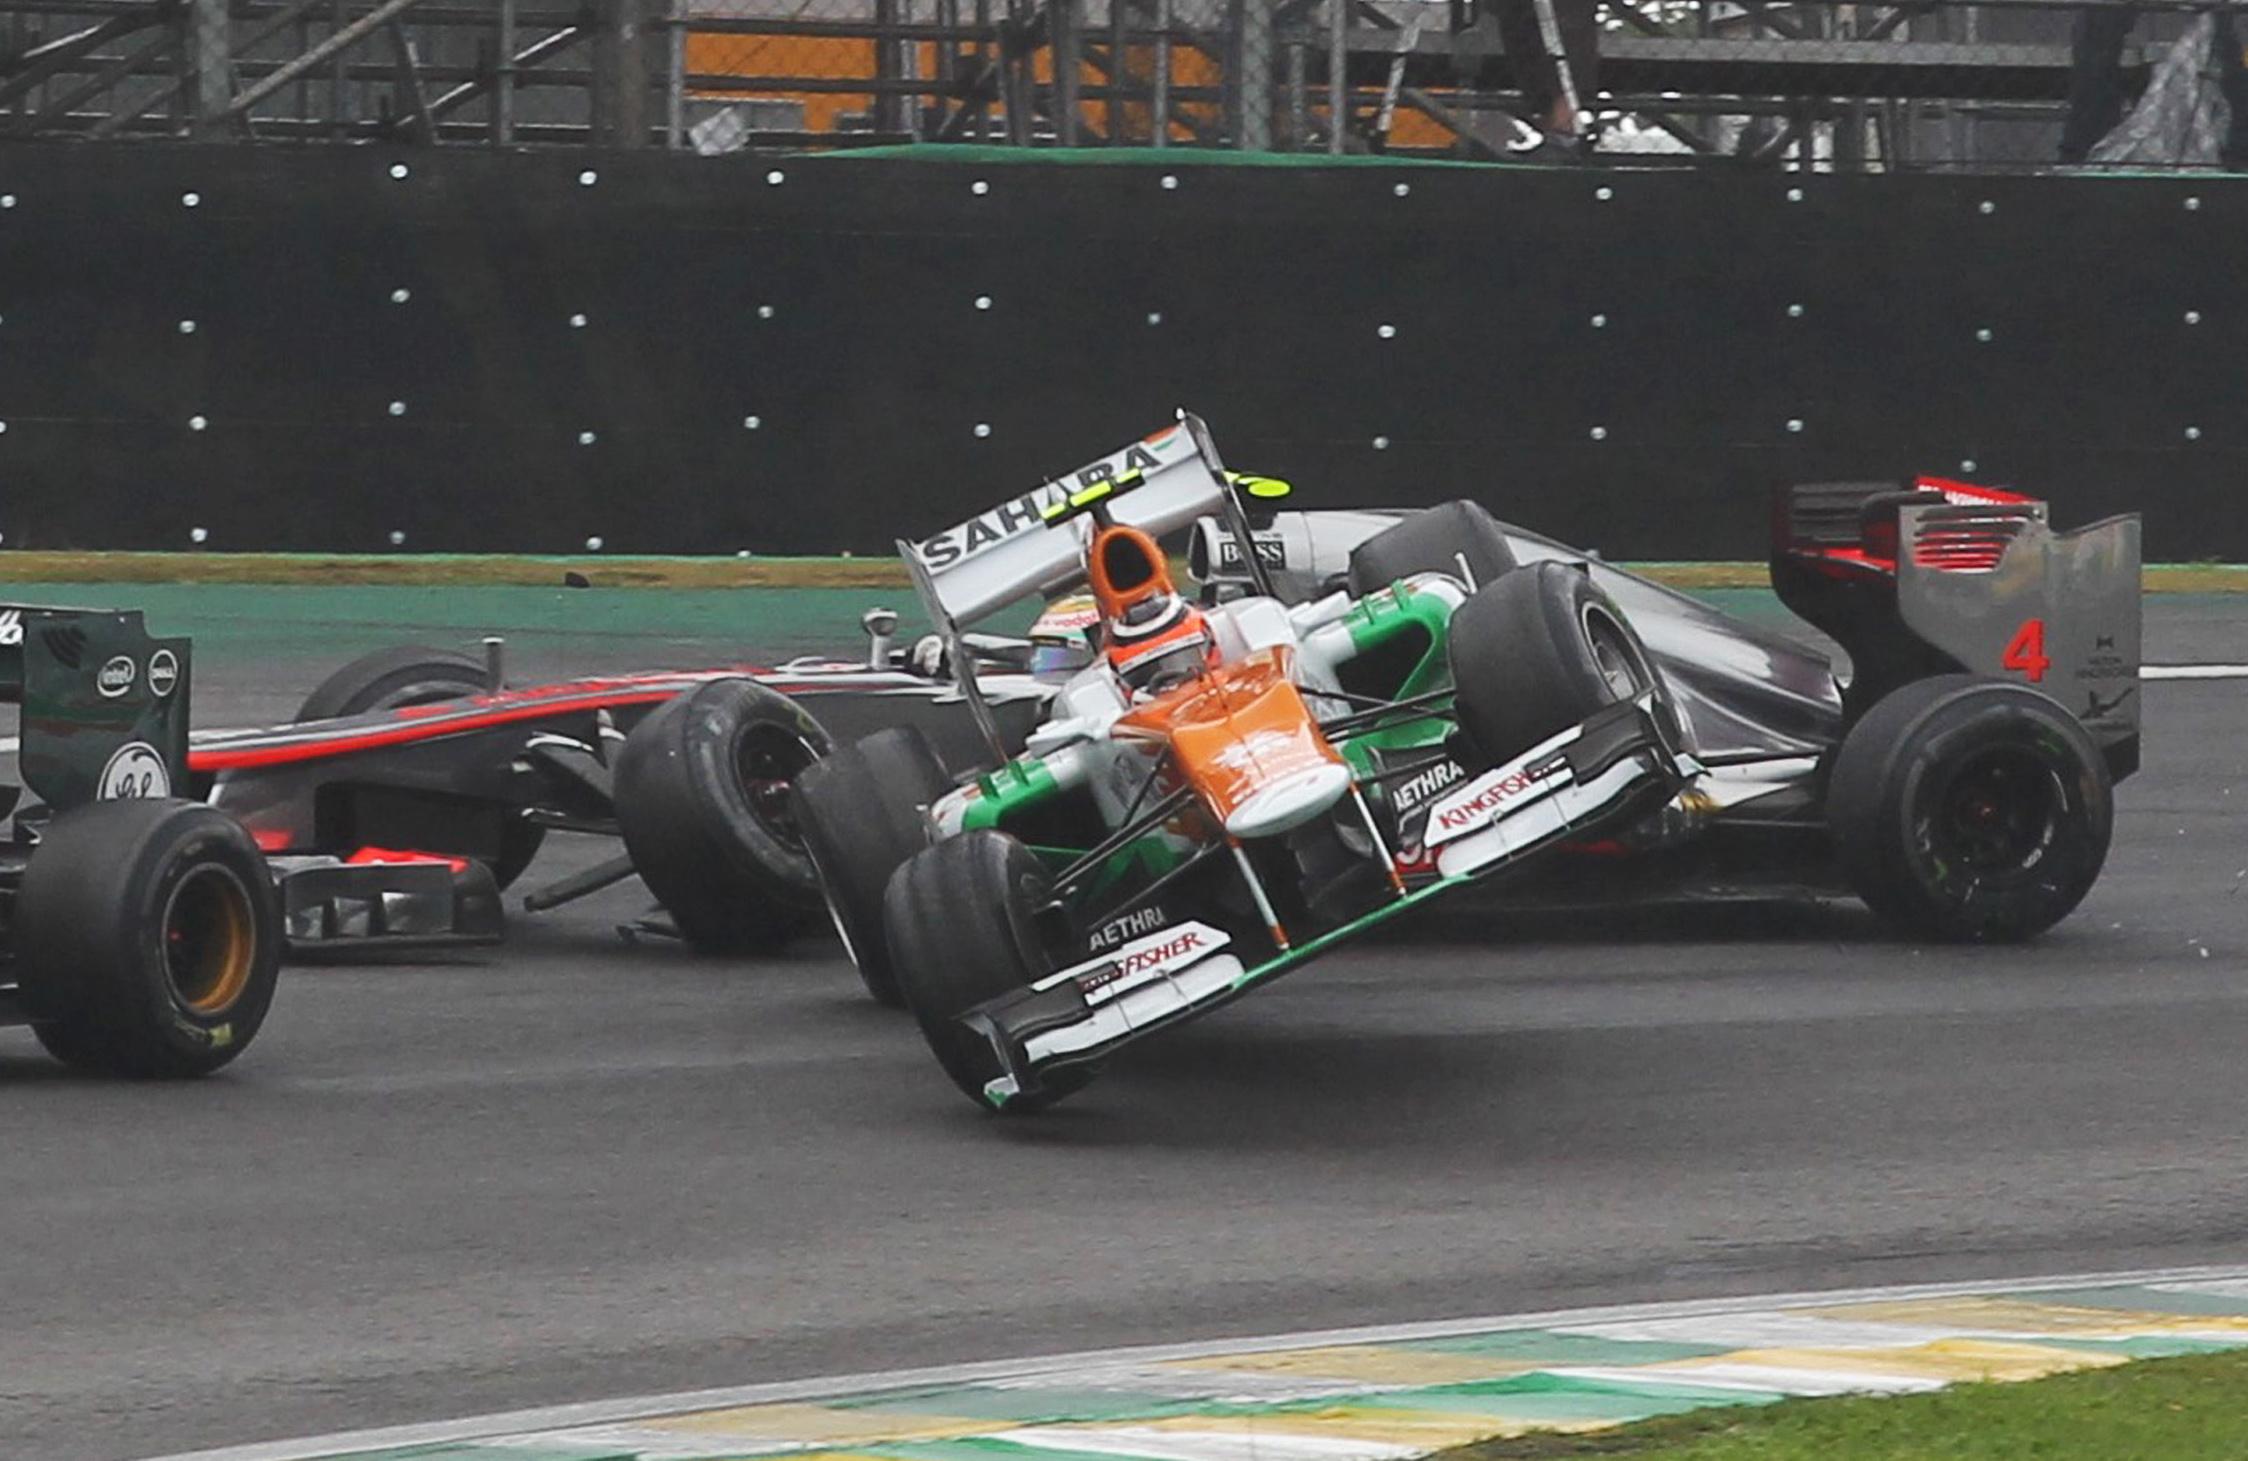 Nico Hulkenberg Lewis Hamilton collision Brazilian Grand Prix 2012 Interlagos